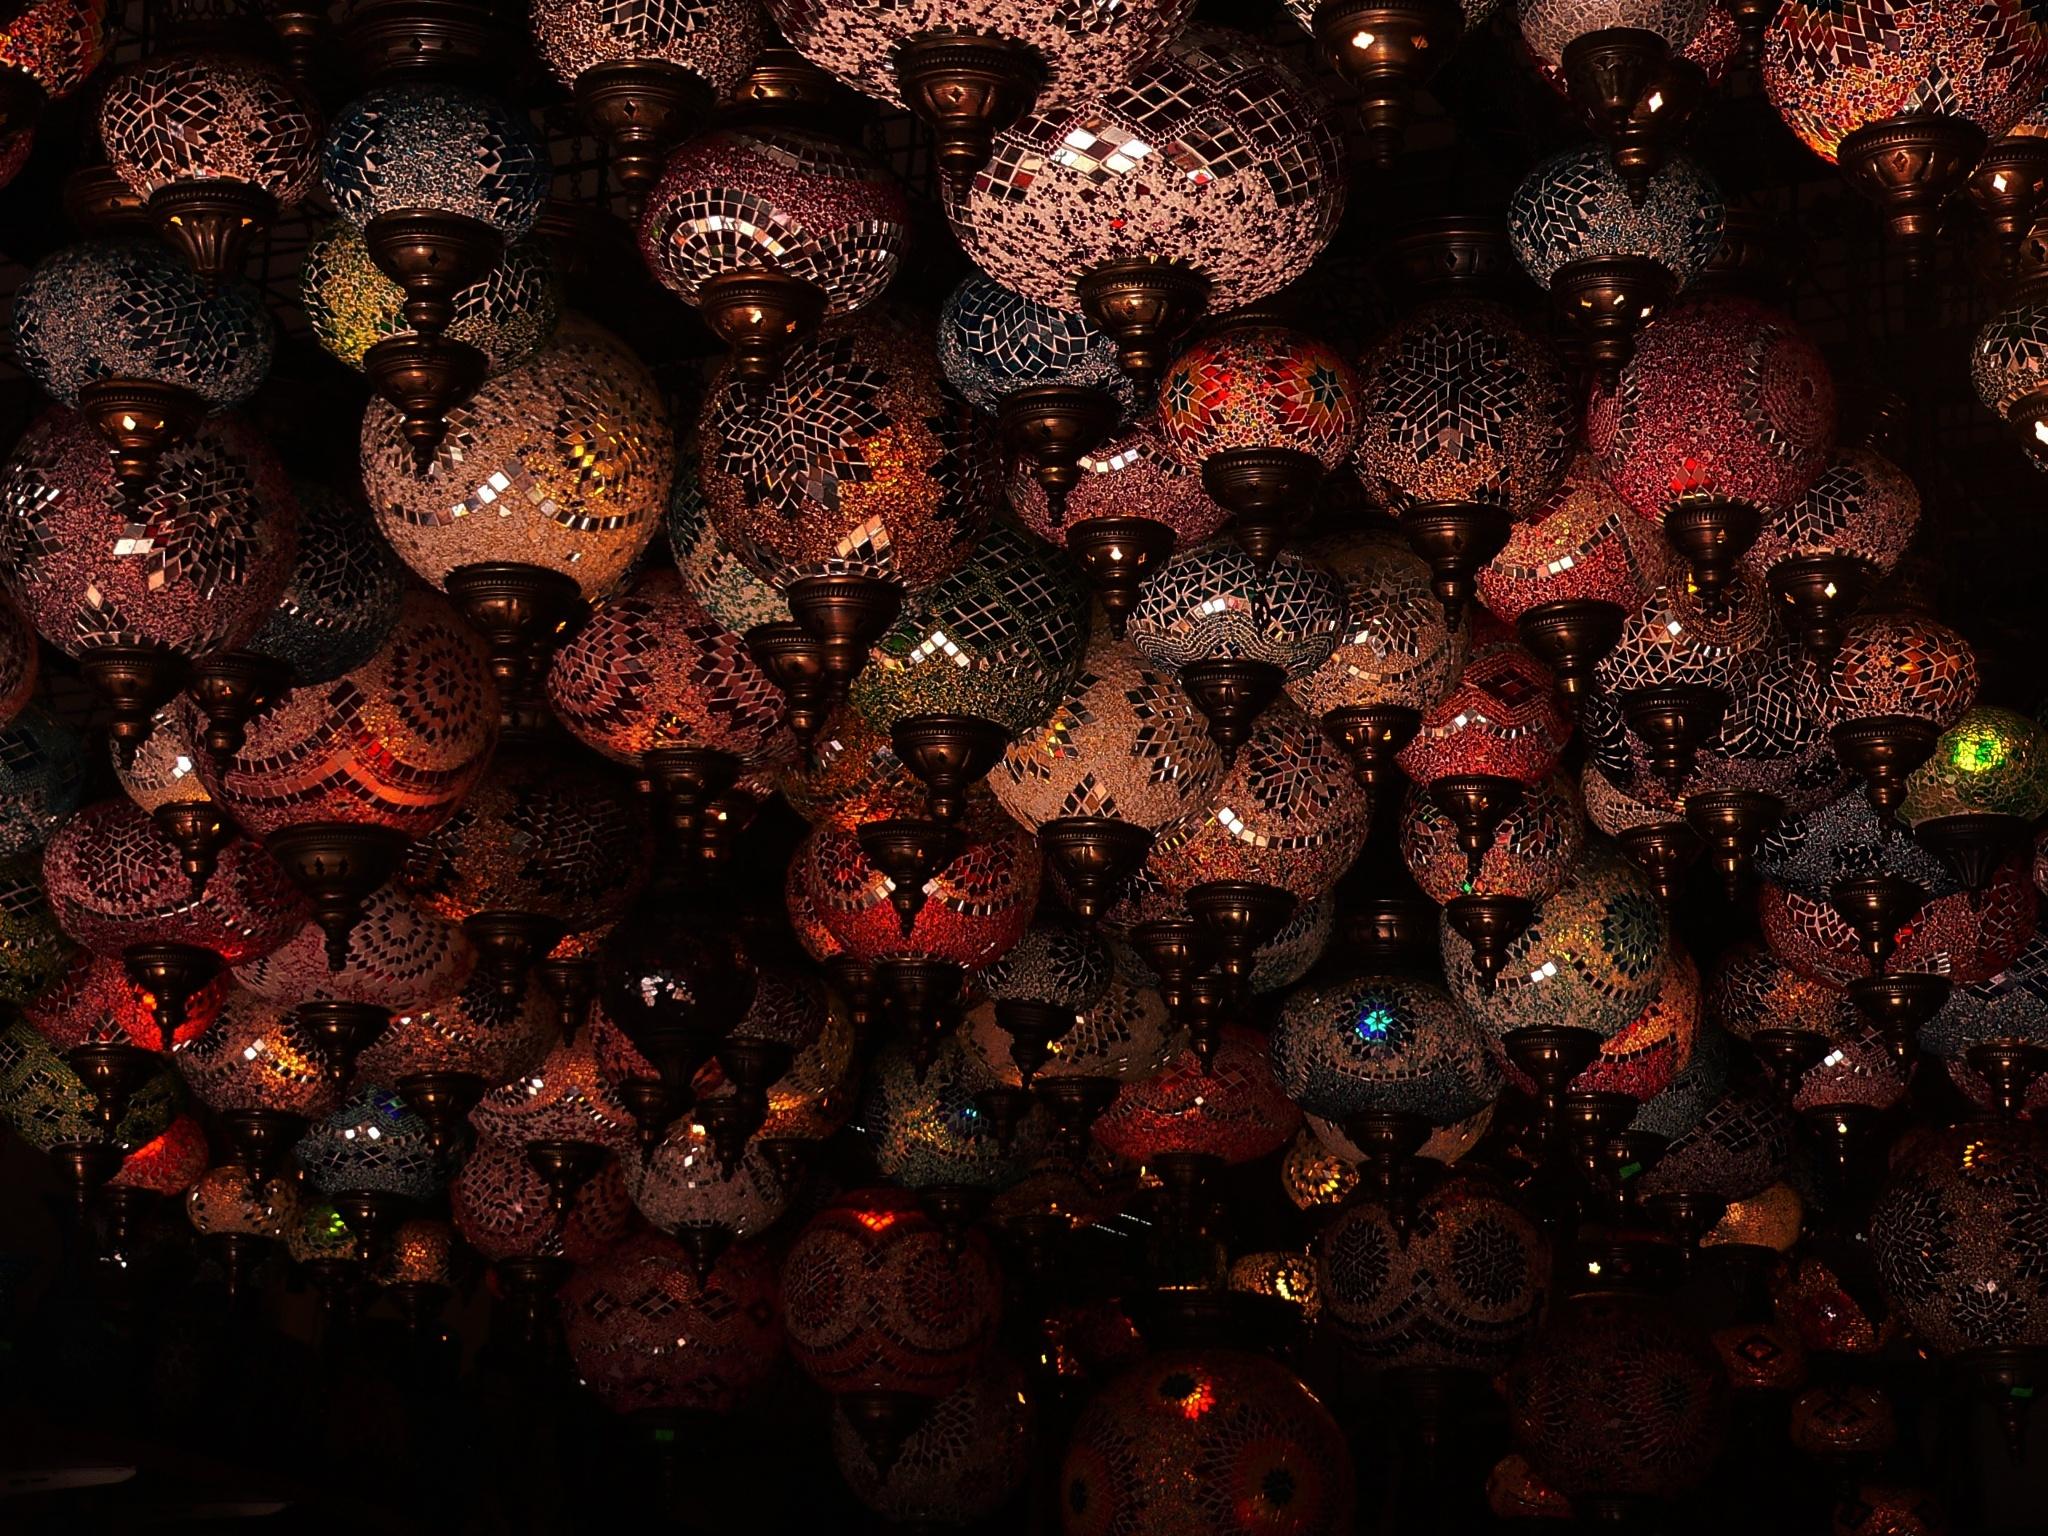 ISTANBUL - Negozio lampade by Fankefrancesco